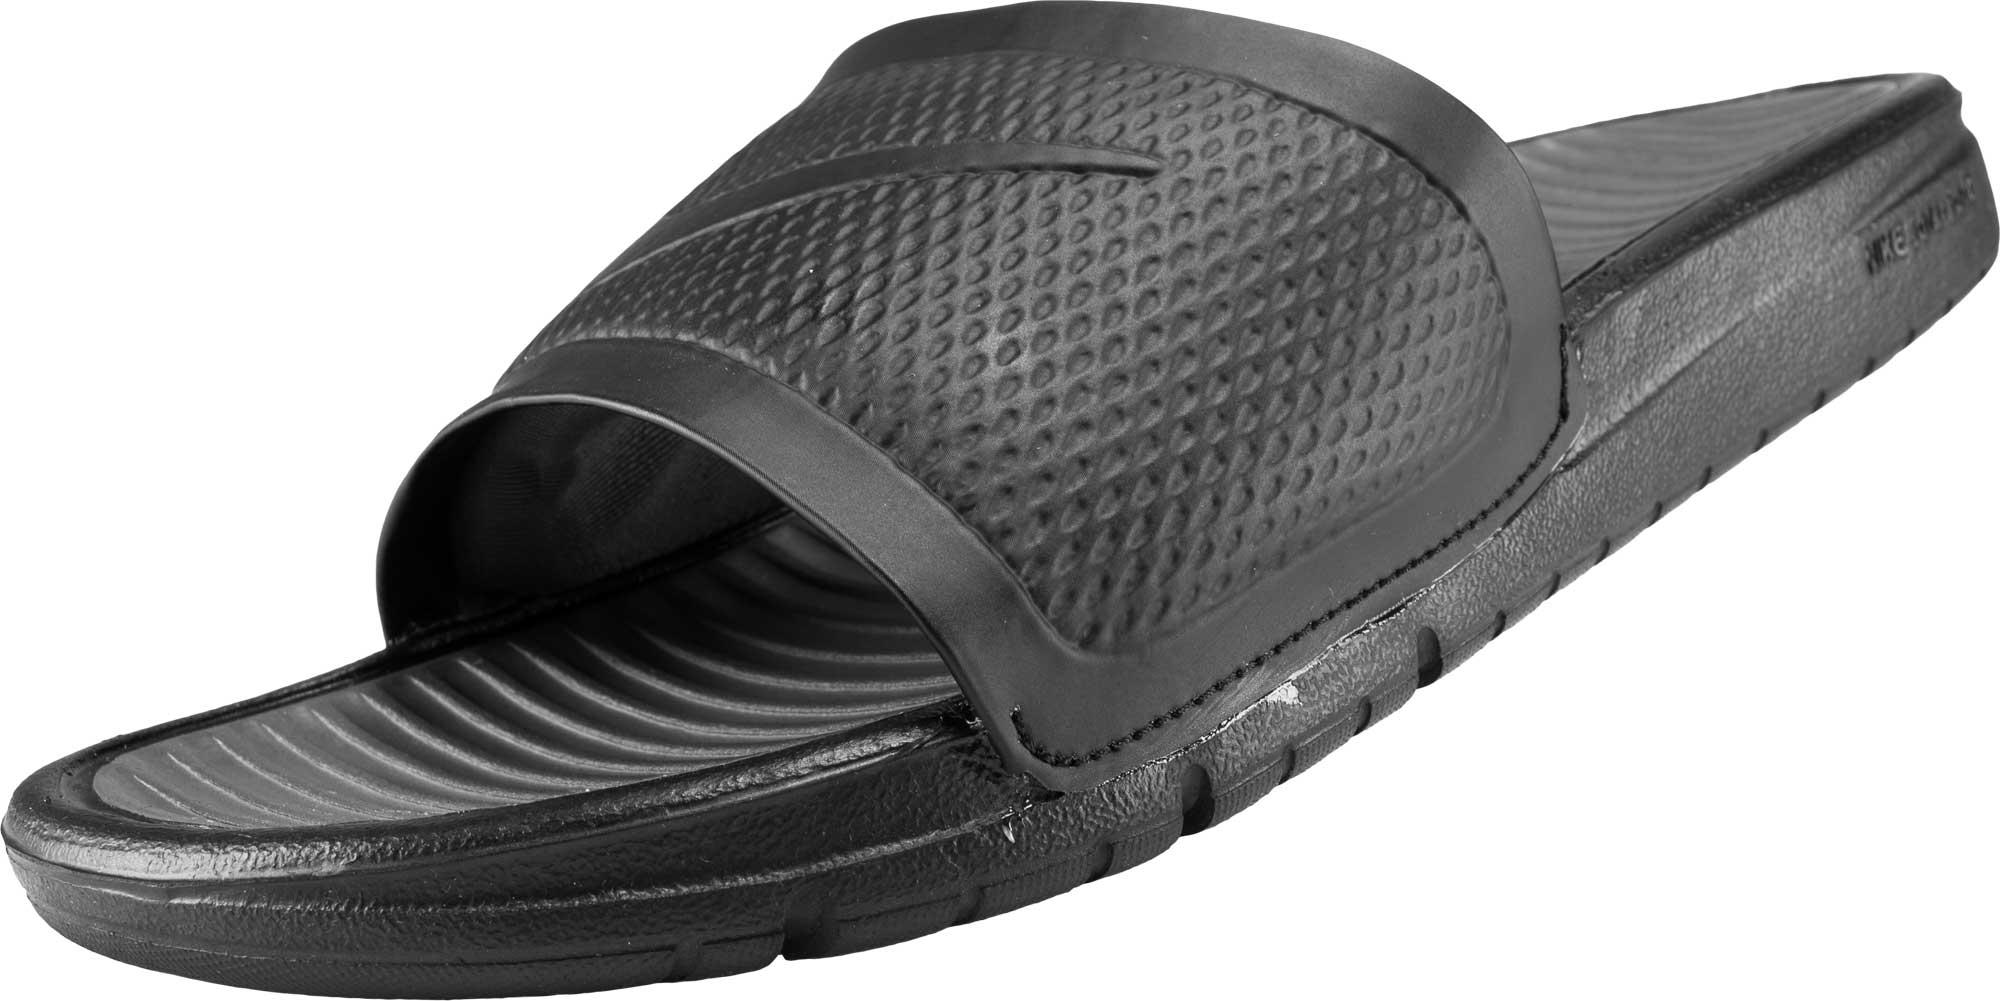 Black Nike Benassi Soccer Sandals Nike Soccer Slides